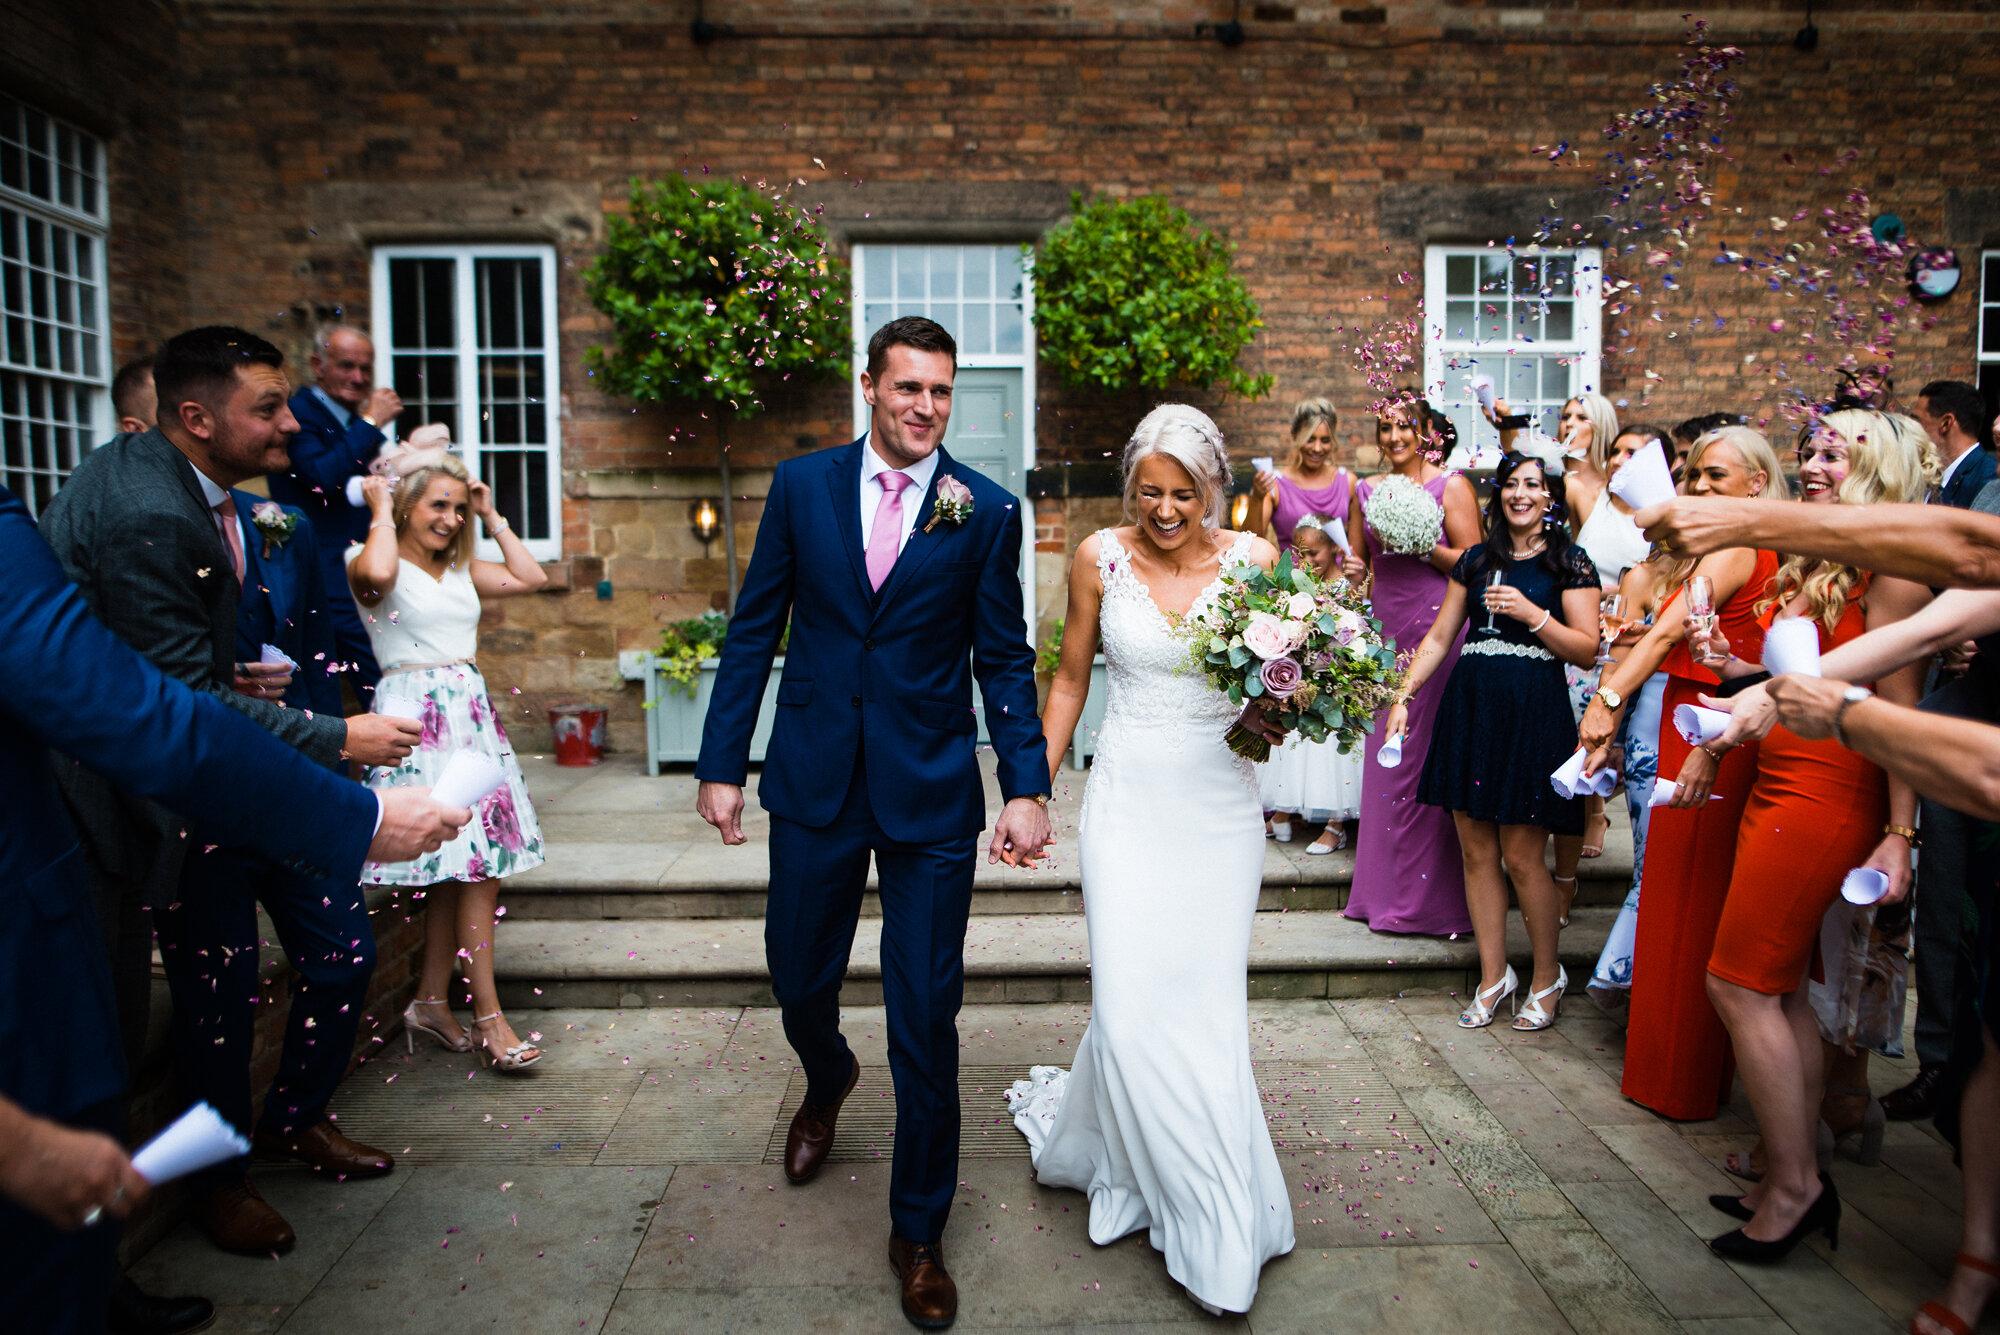 West Mills wedding venue 27.jpg